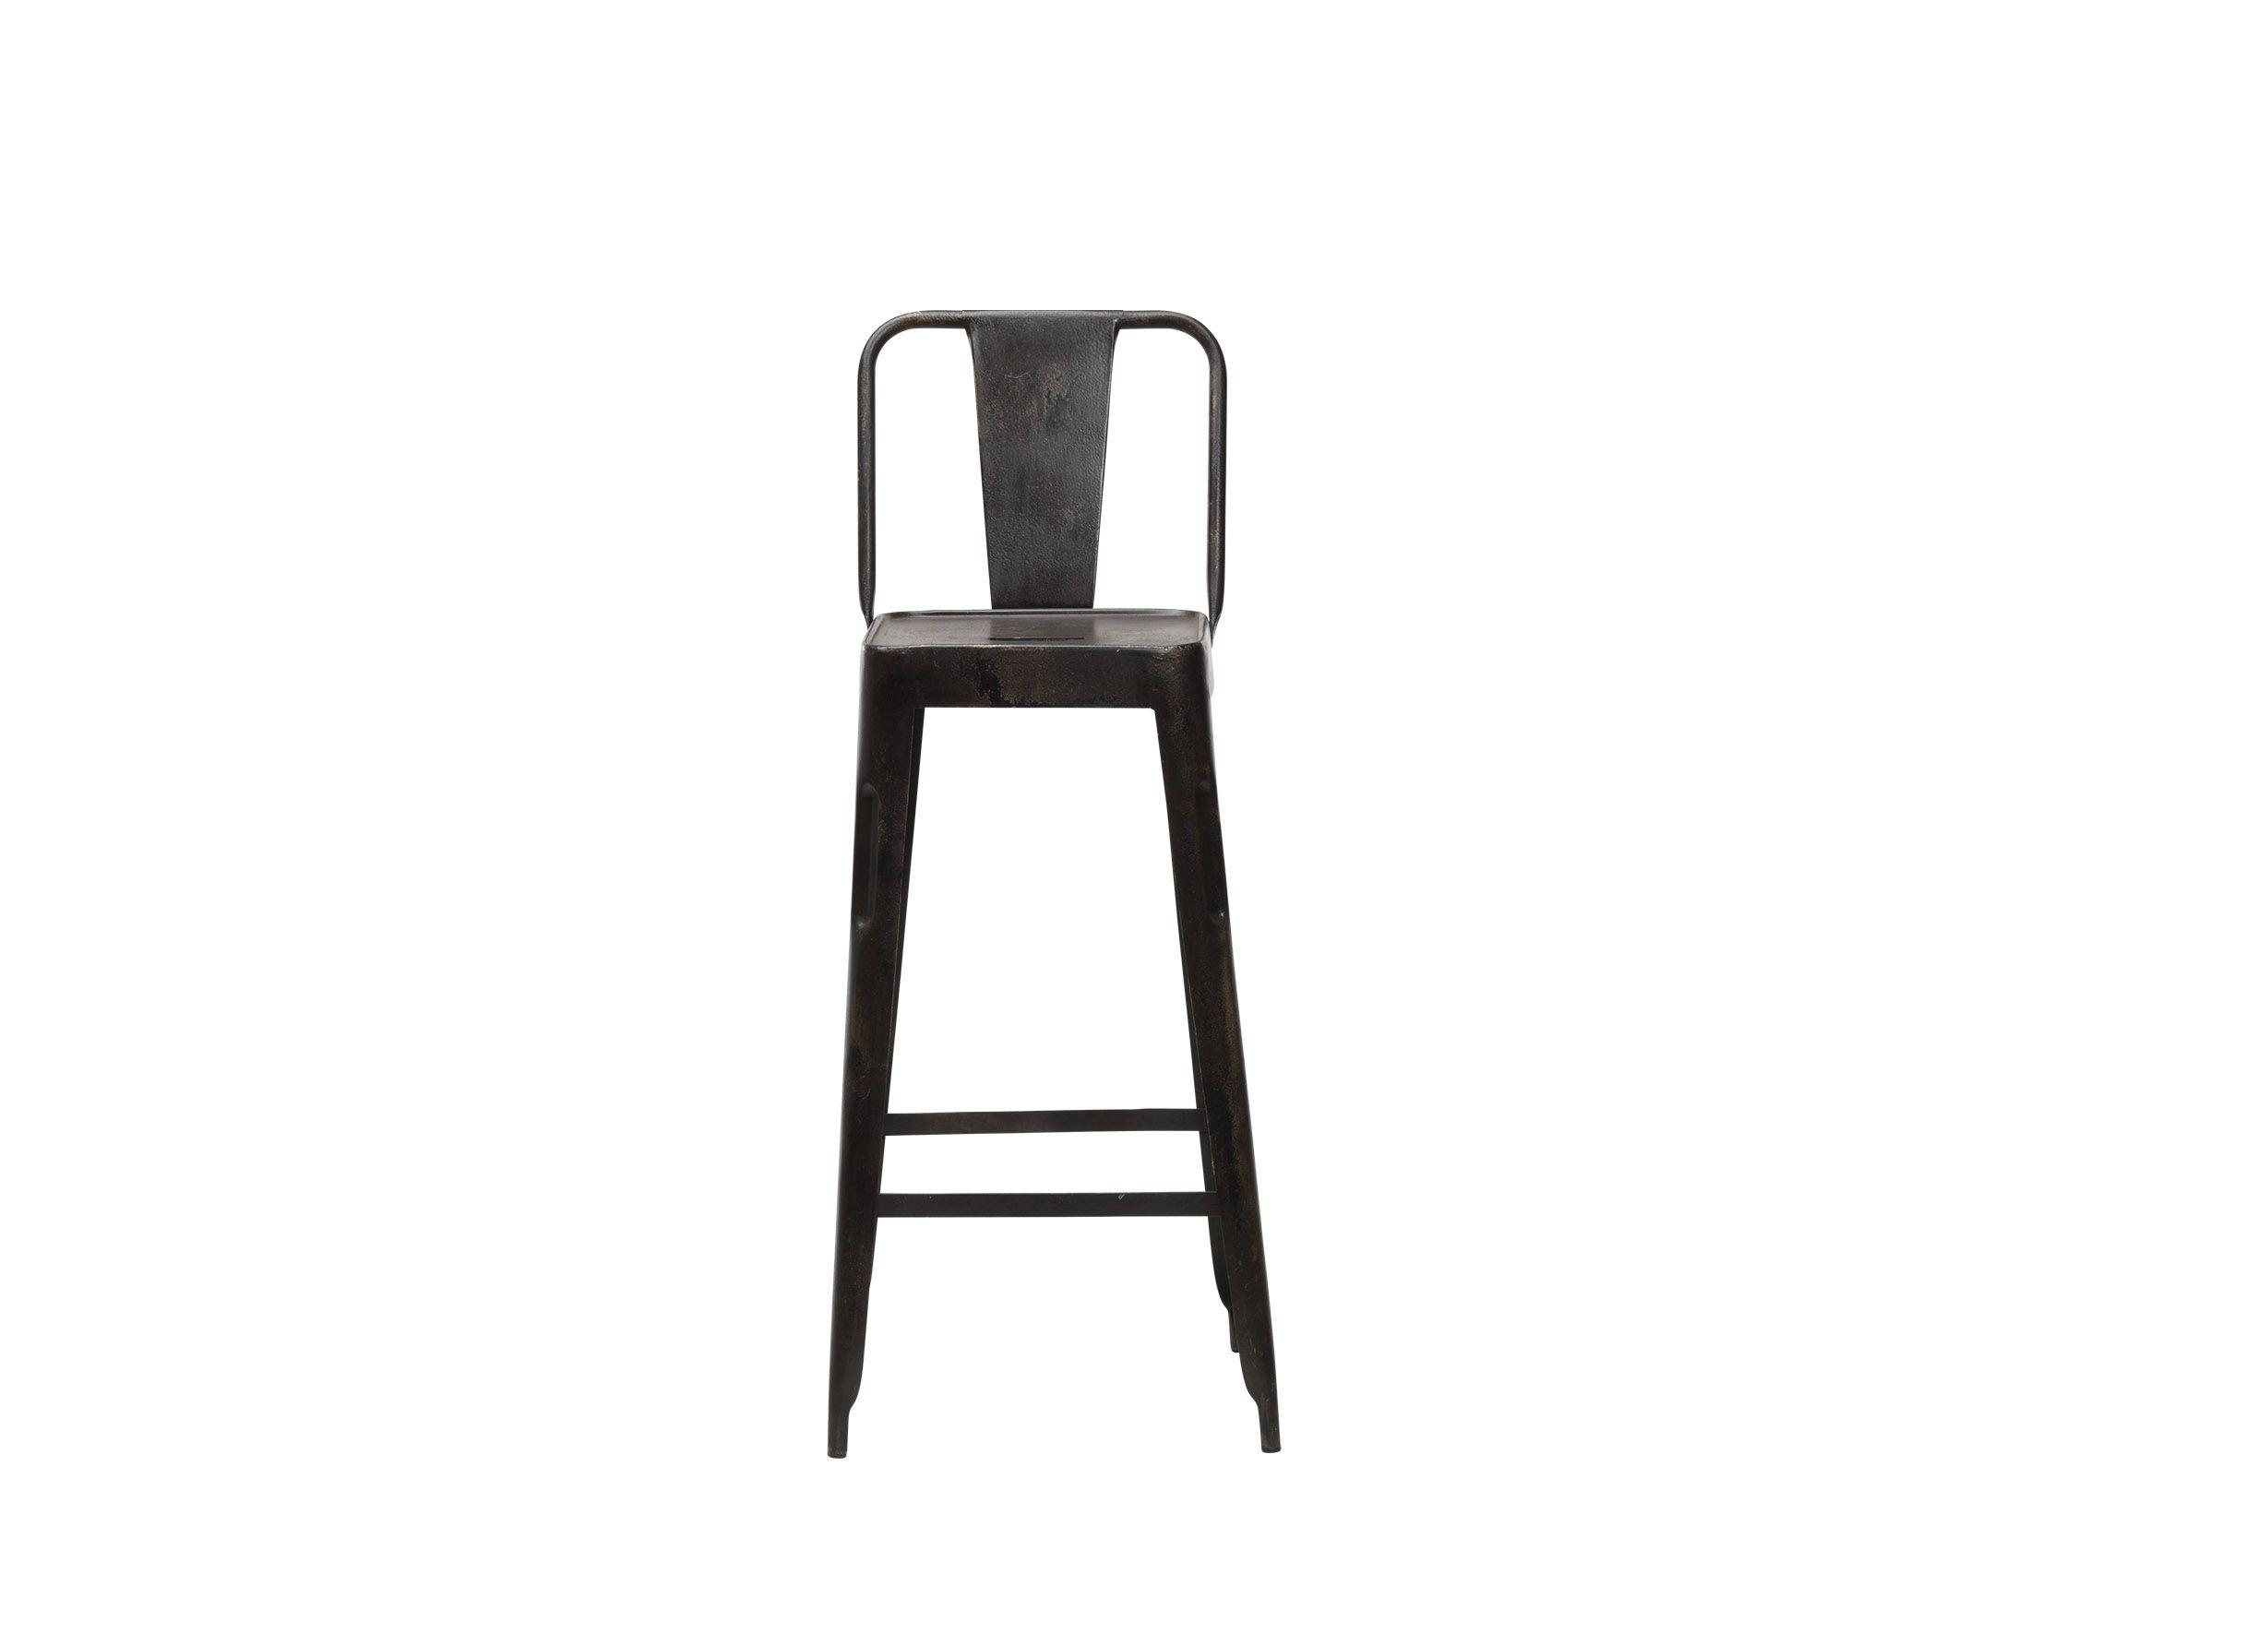 Chaise haute (77cm) en métal vieilli Chari * Nkuku